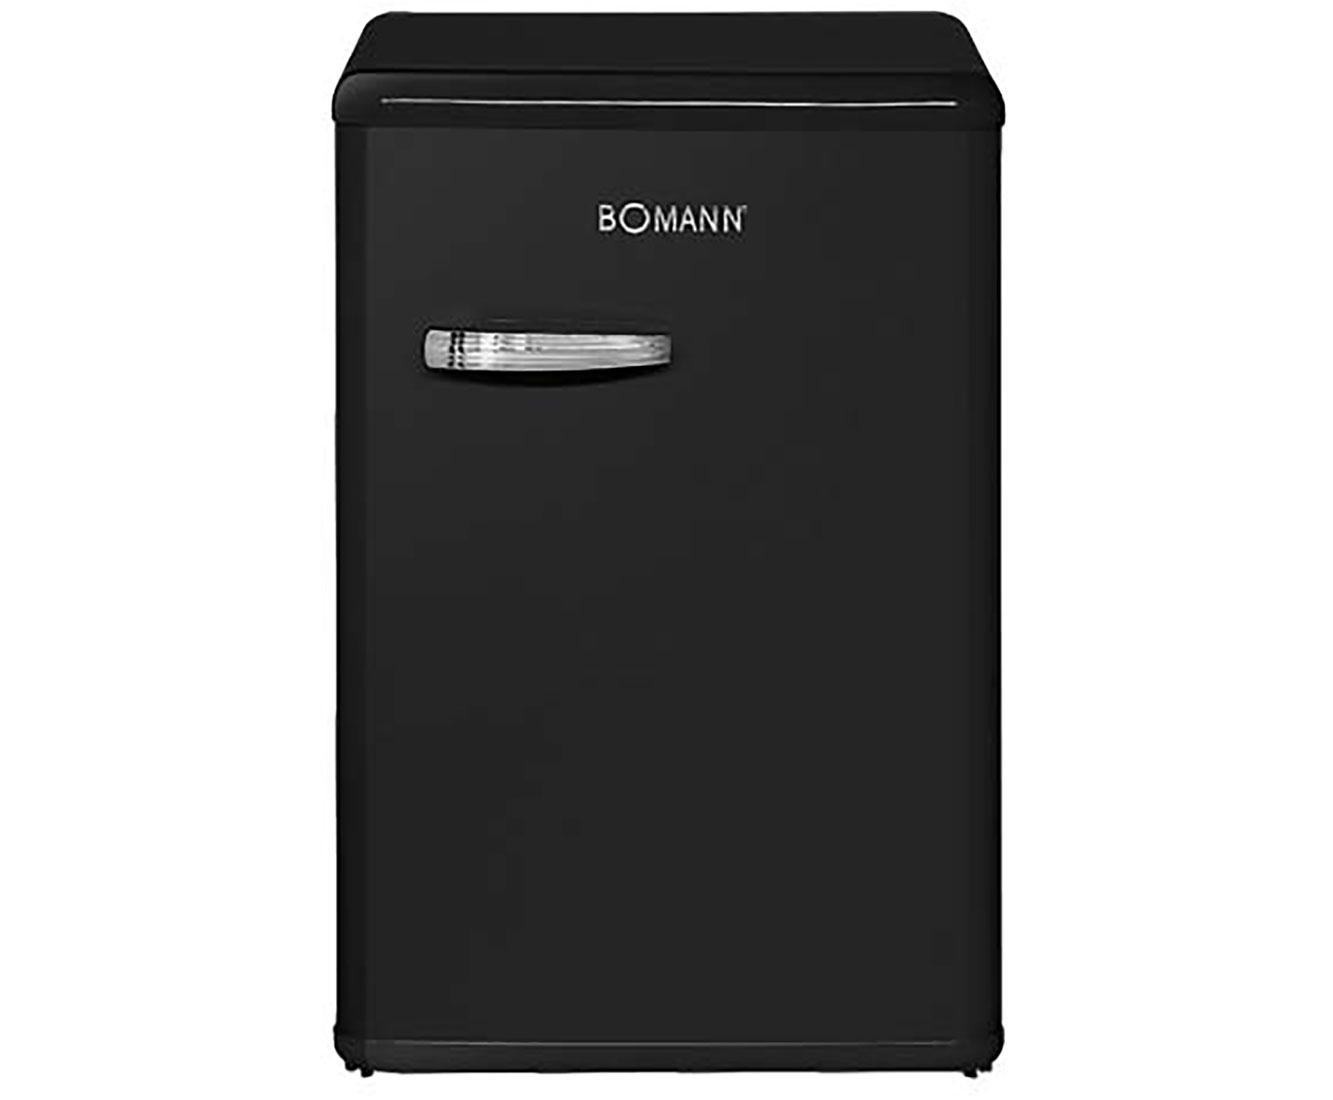 Amica Kühlschrank Ks 15123 W : Gewicht kühlschrank minikühlschrank single party kühlschrank 47